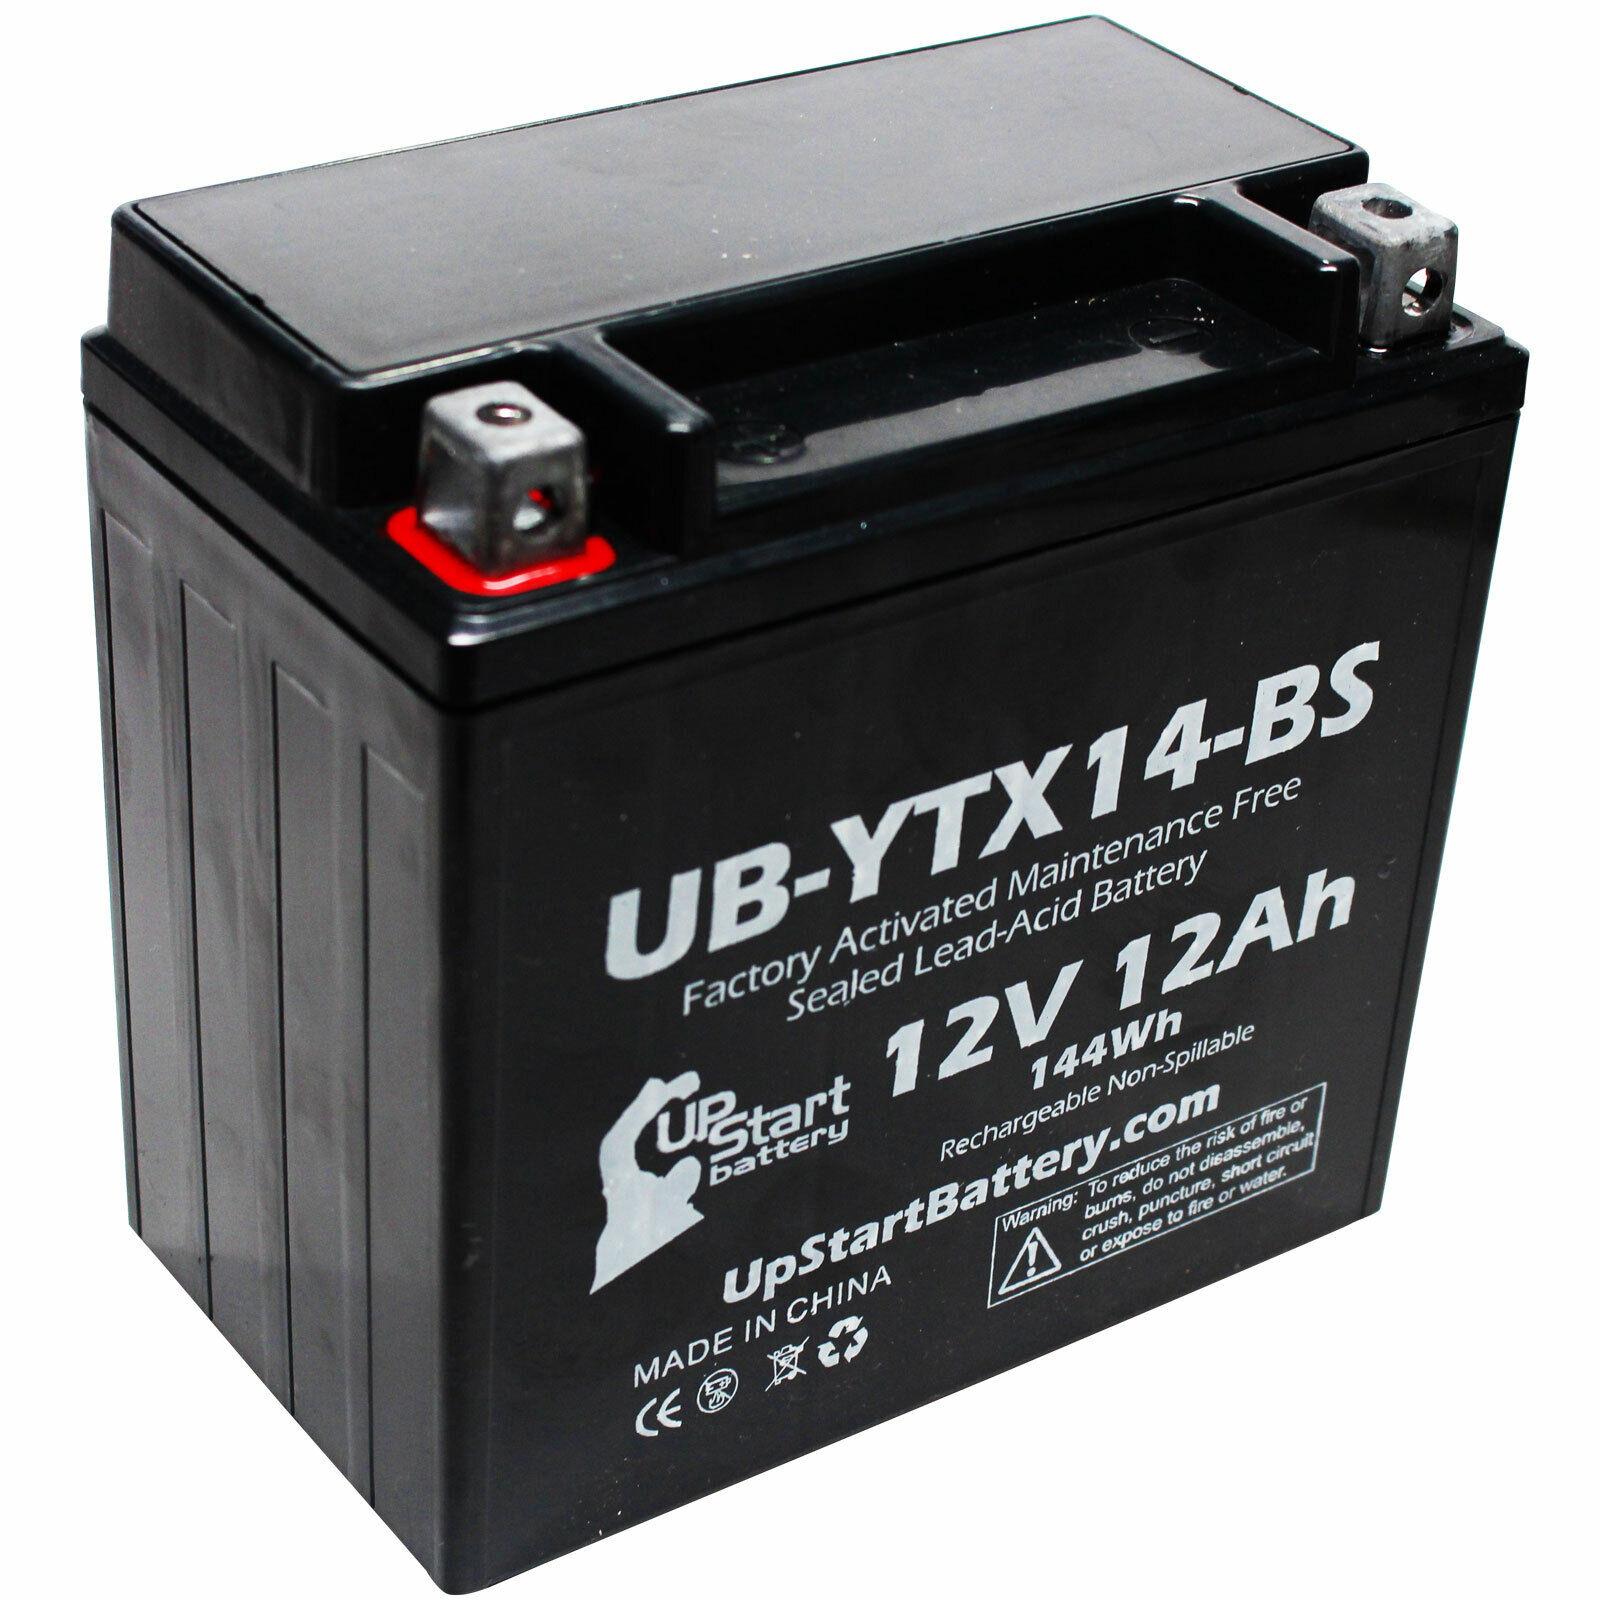 12V 12AH Battery for 1988 Honda TRX300,FW FourTrax 300, 4x4 300 CC